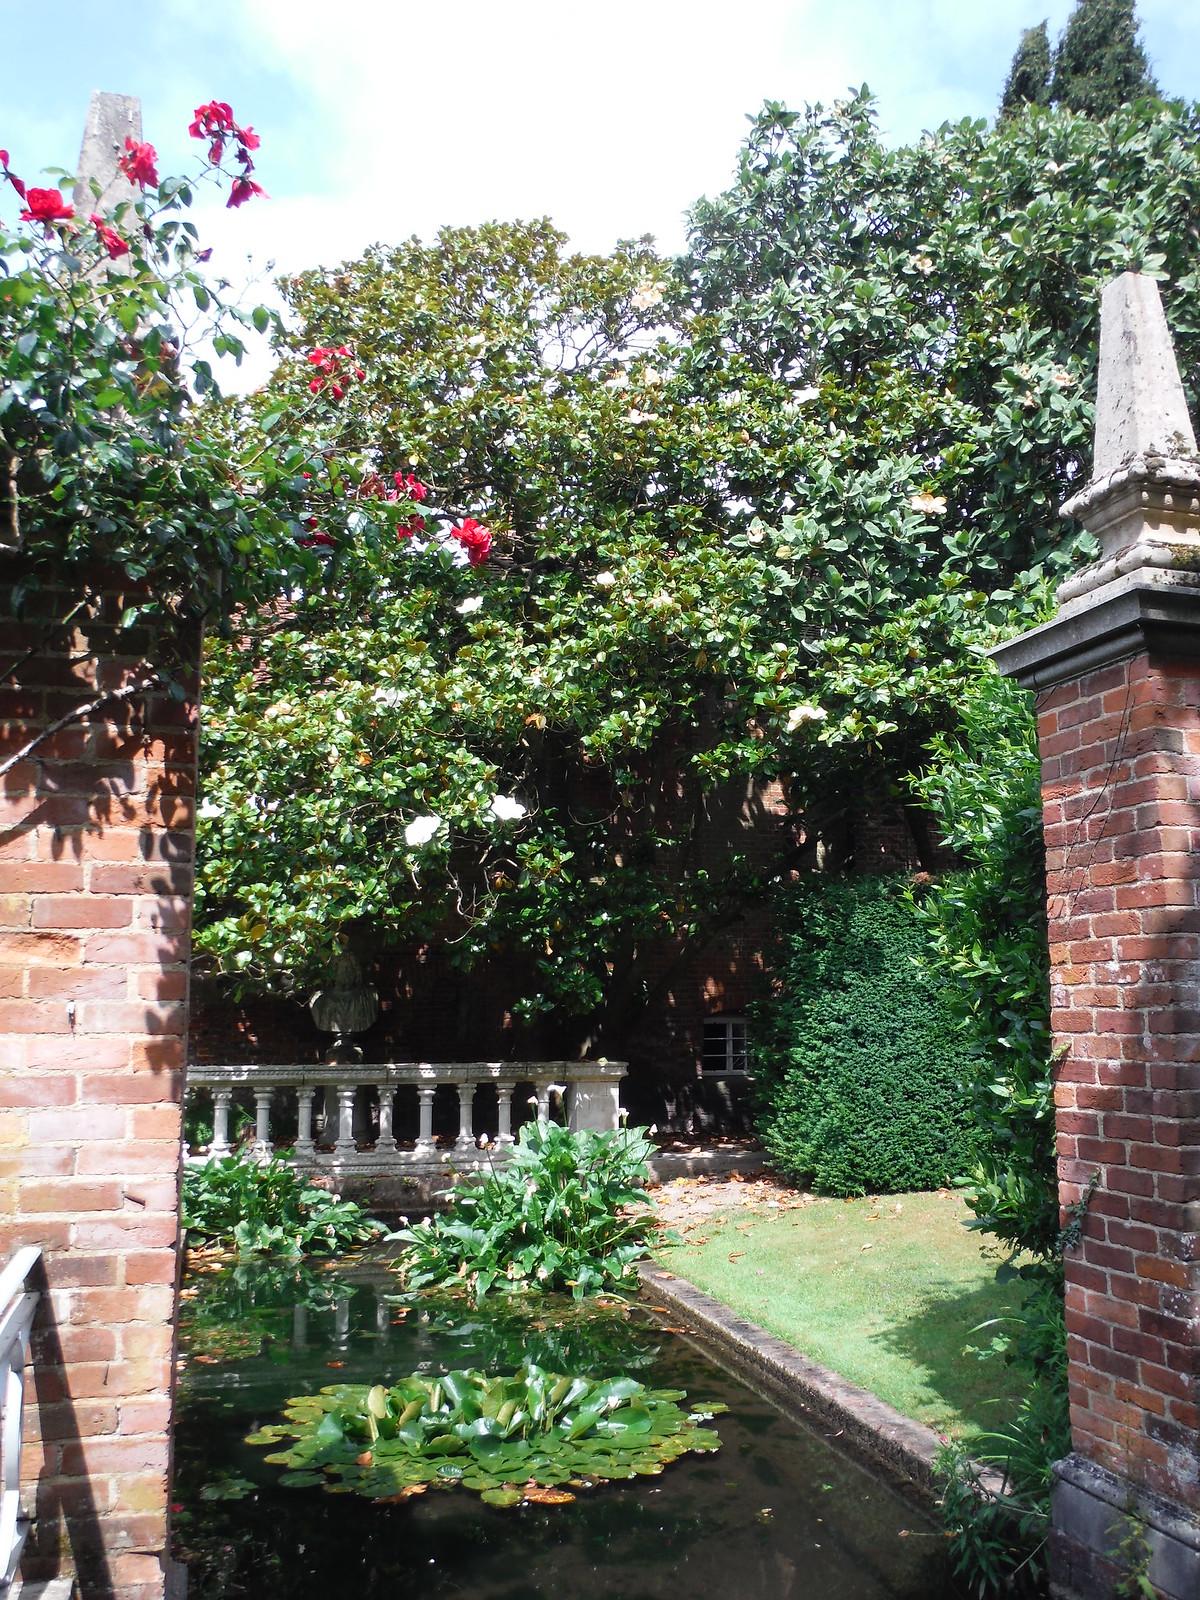 Water Garden with Magnolias SWC Walk 15 : Winchester Circular